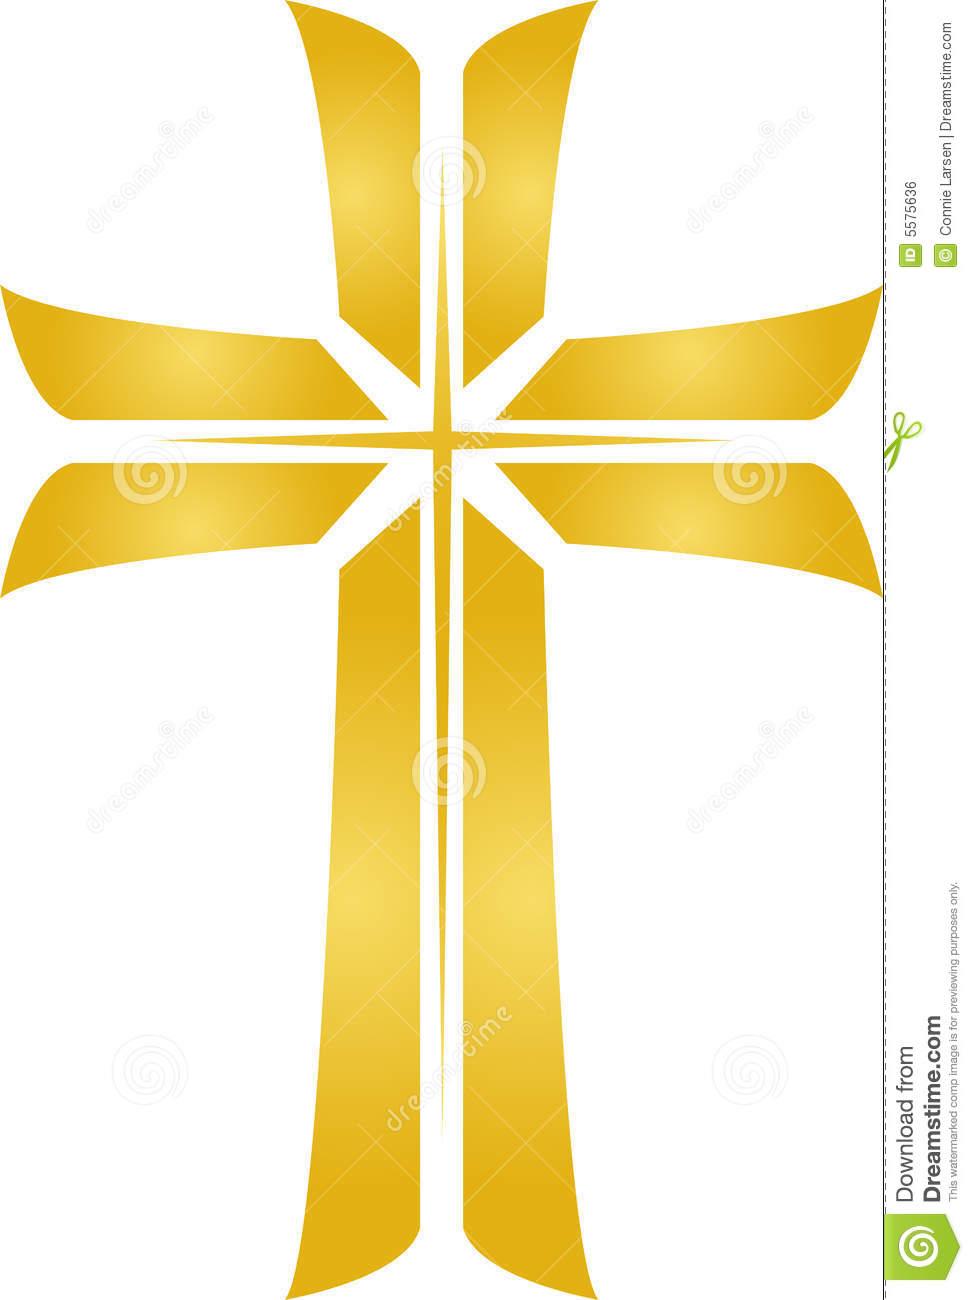 Golden Star Cross/eps Royalty Free Stock Image.